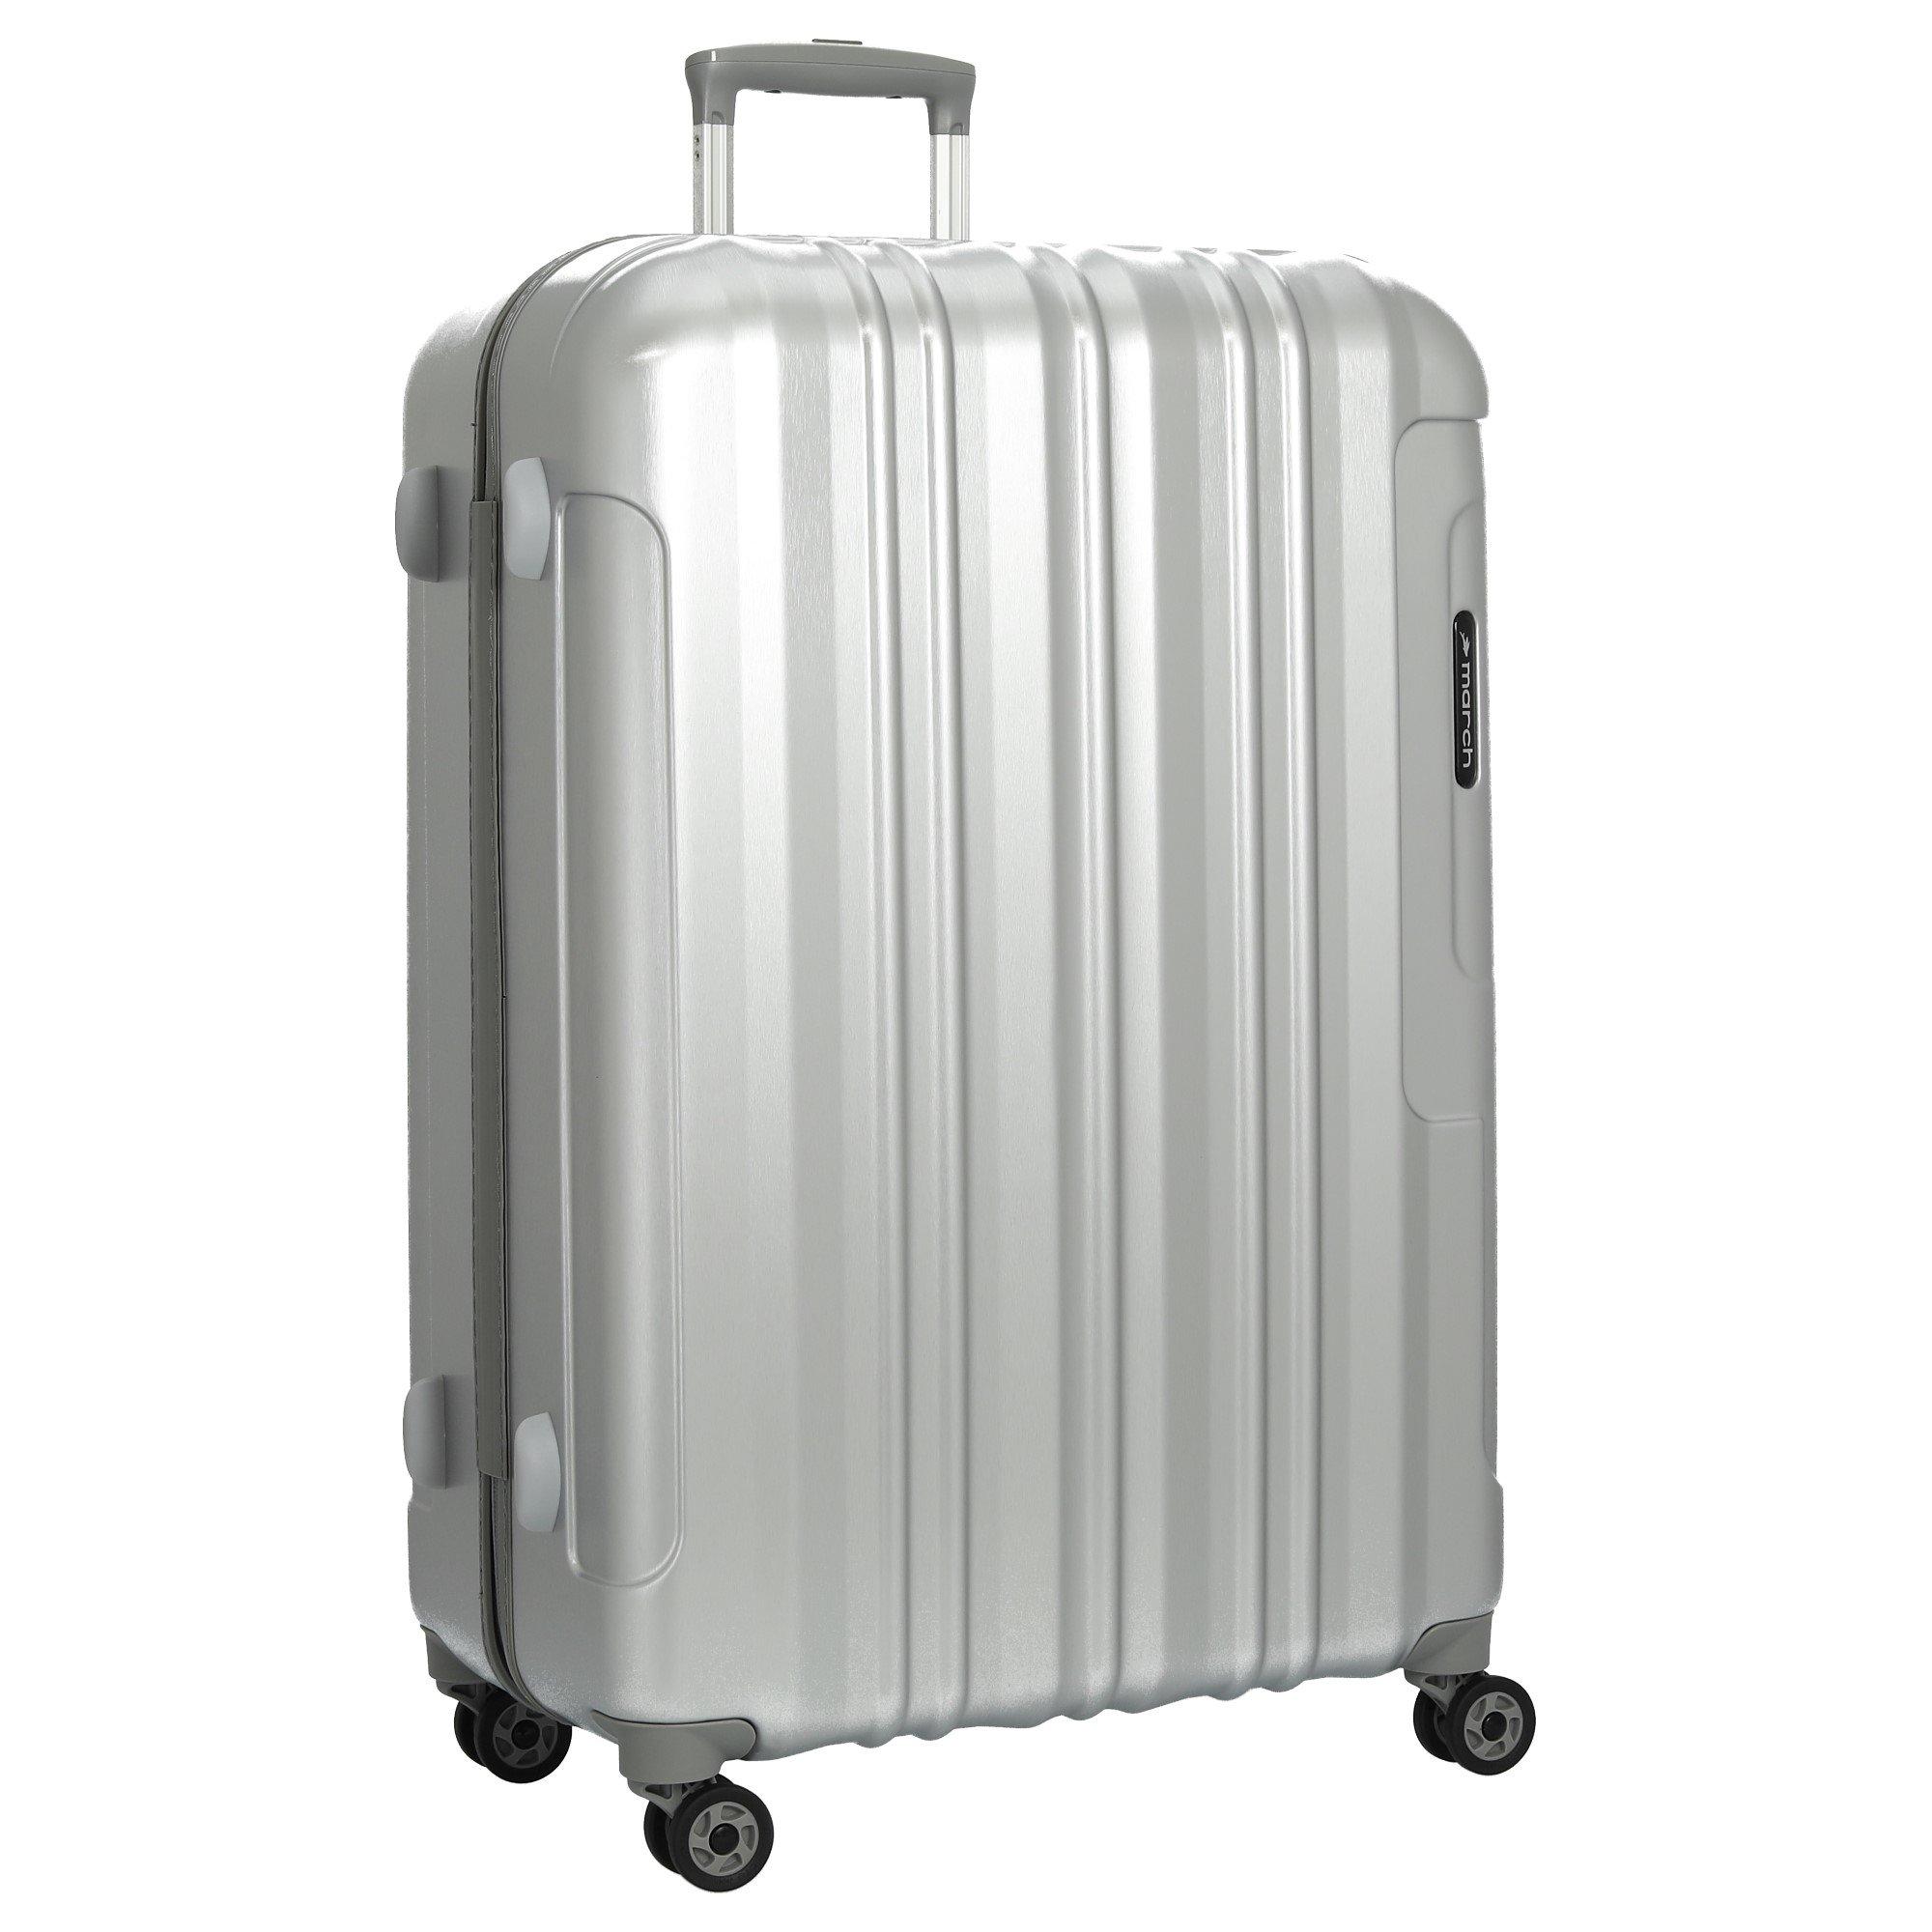 Koffer March Bewertung